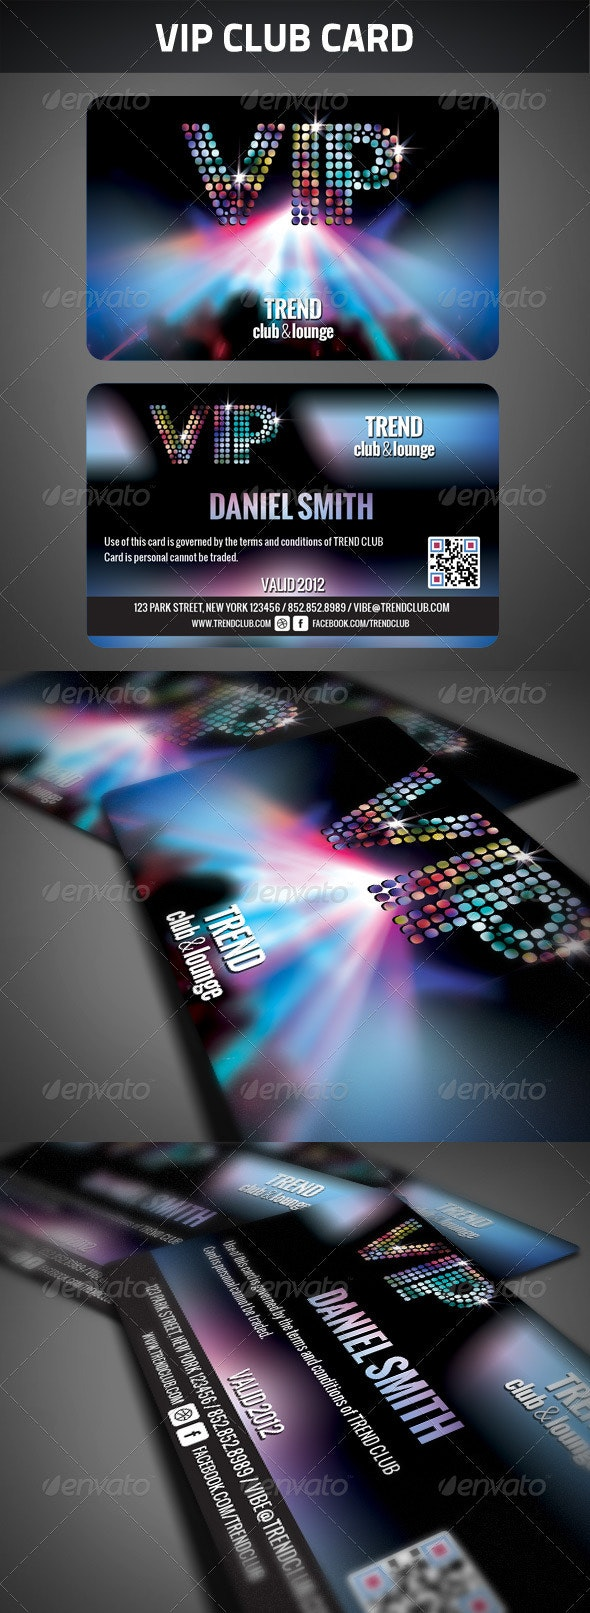 VIP Club Membership Card - Cards & Invites Print Templates